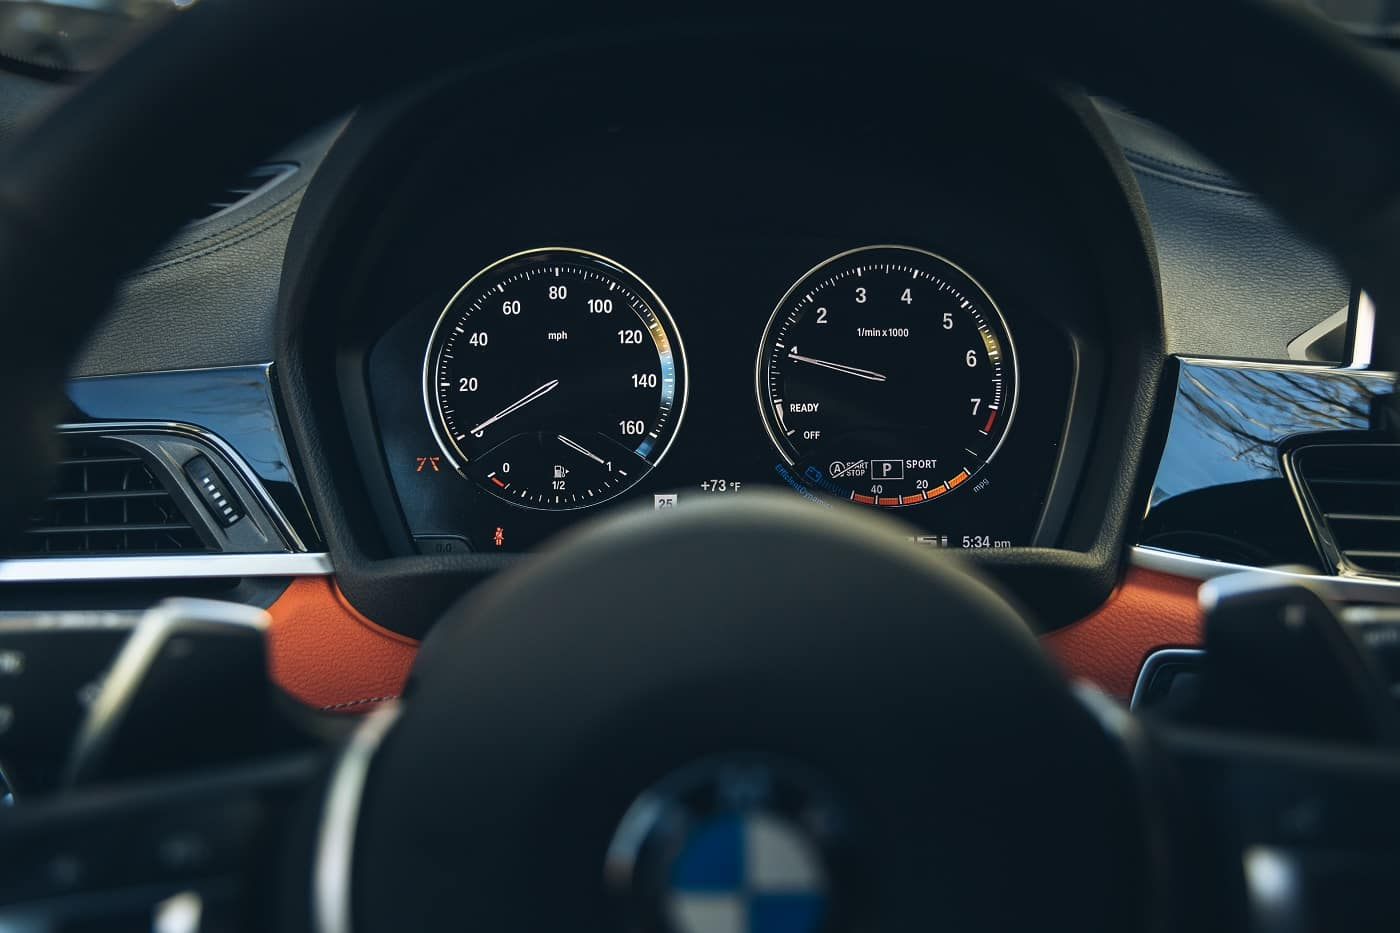 BMW X2 Safety